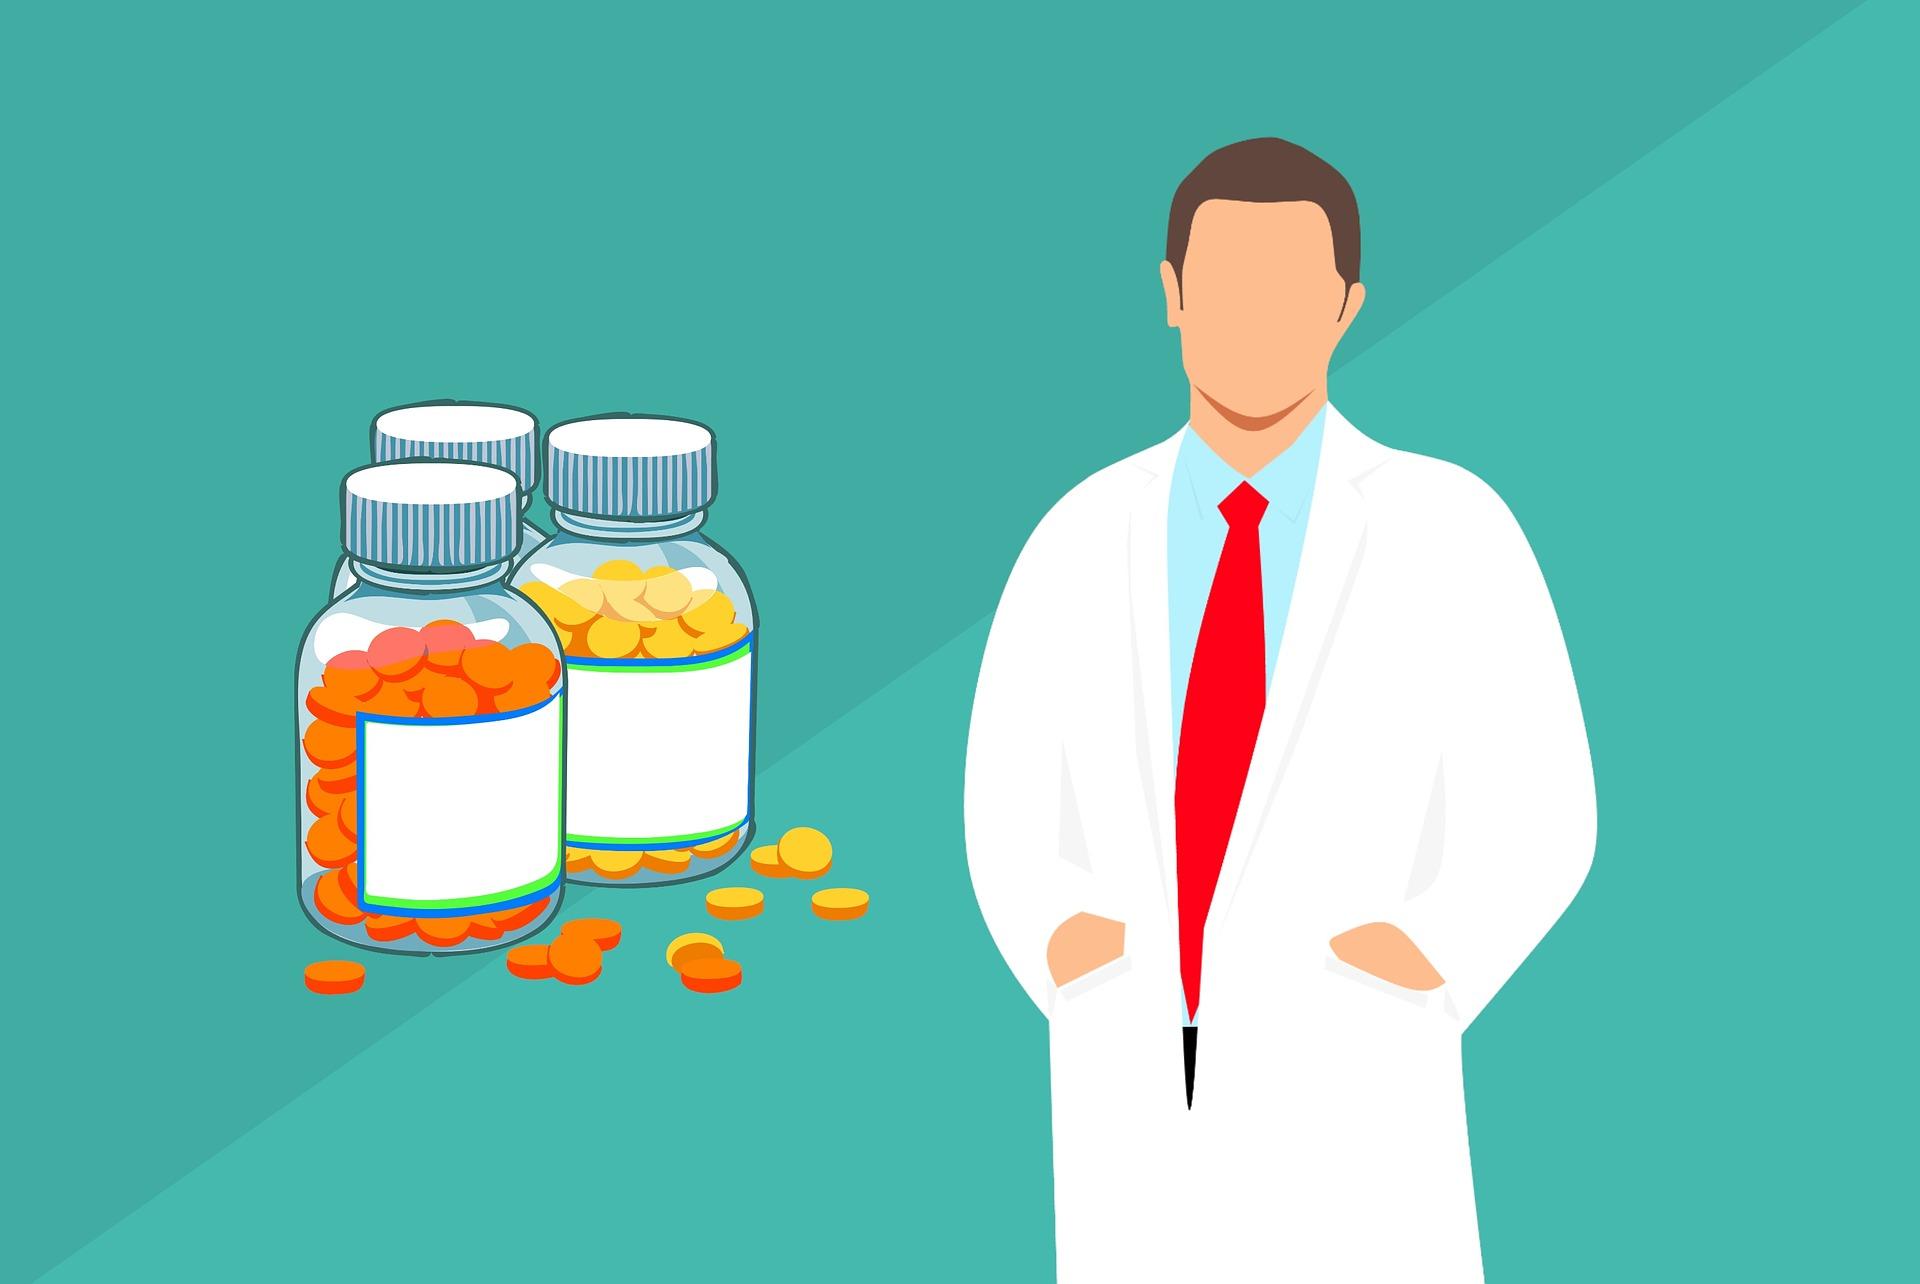 pharmacist-3646195_1920